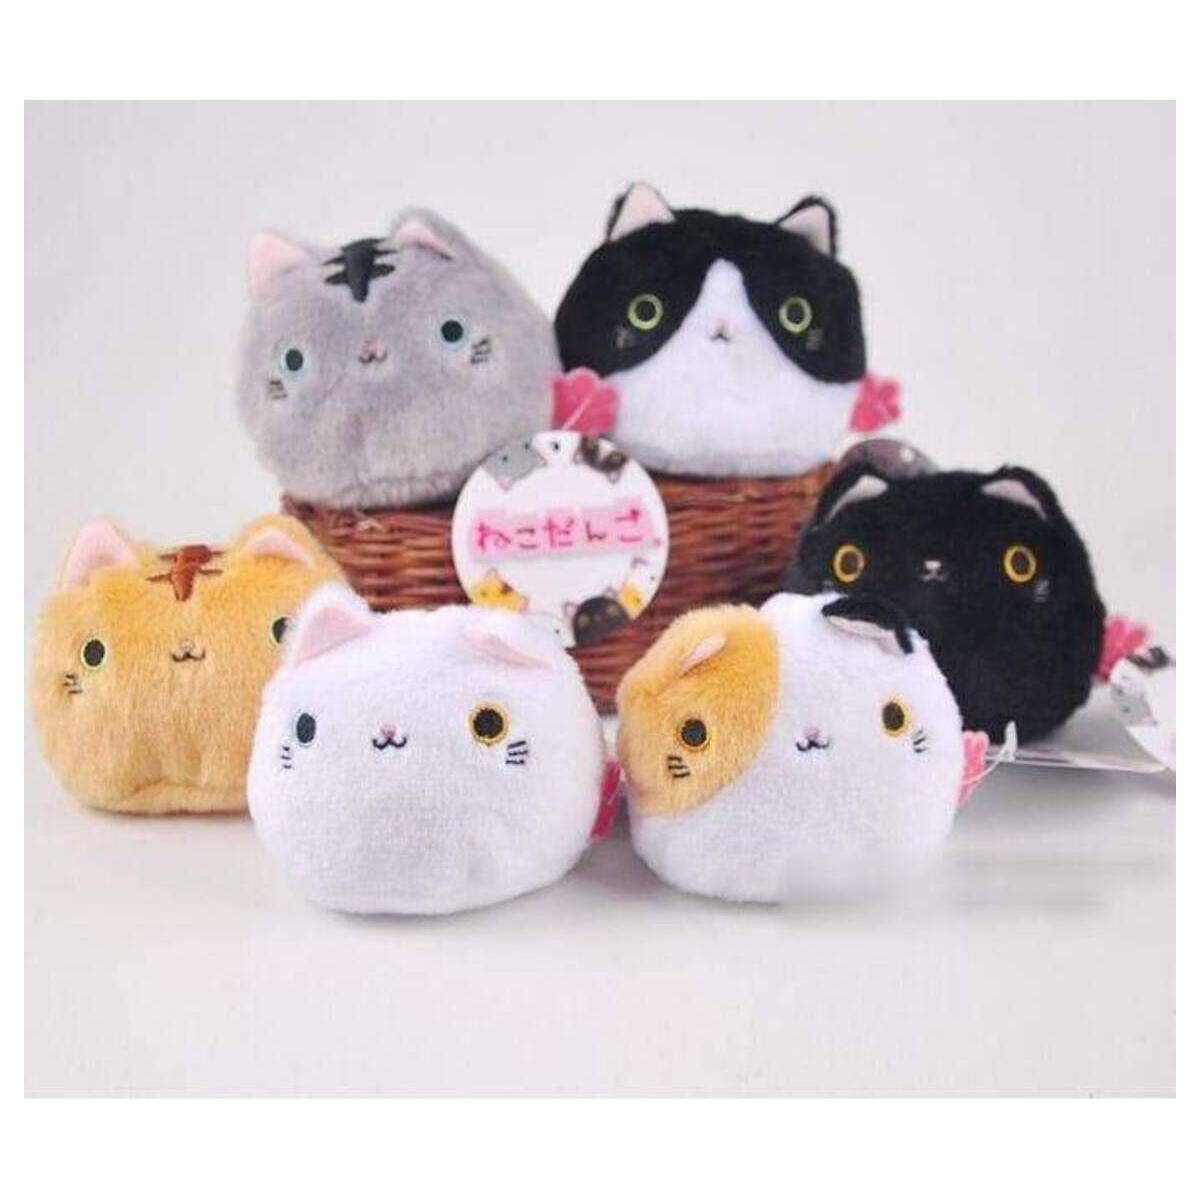 KAWAII Cats Shape Interactive Stuffed Toy